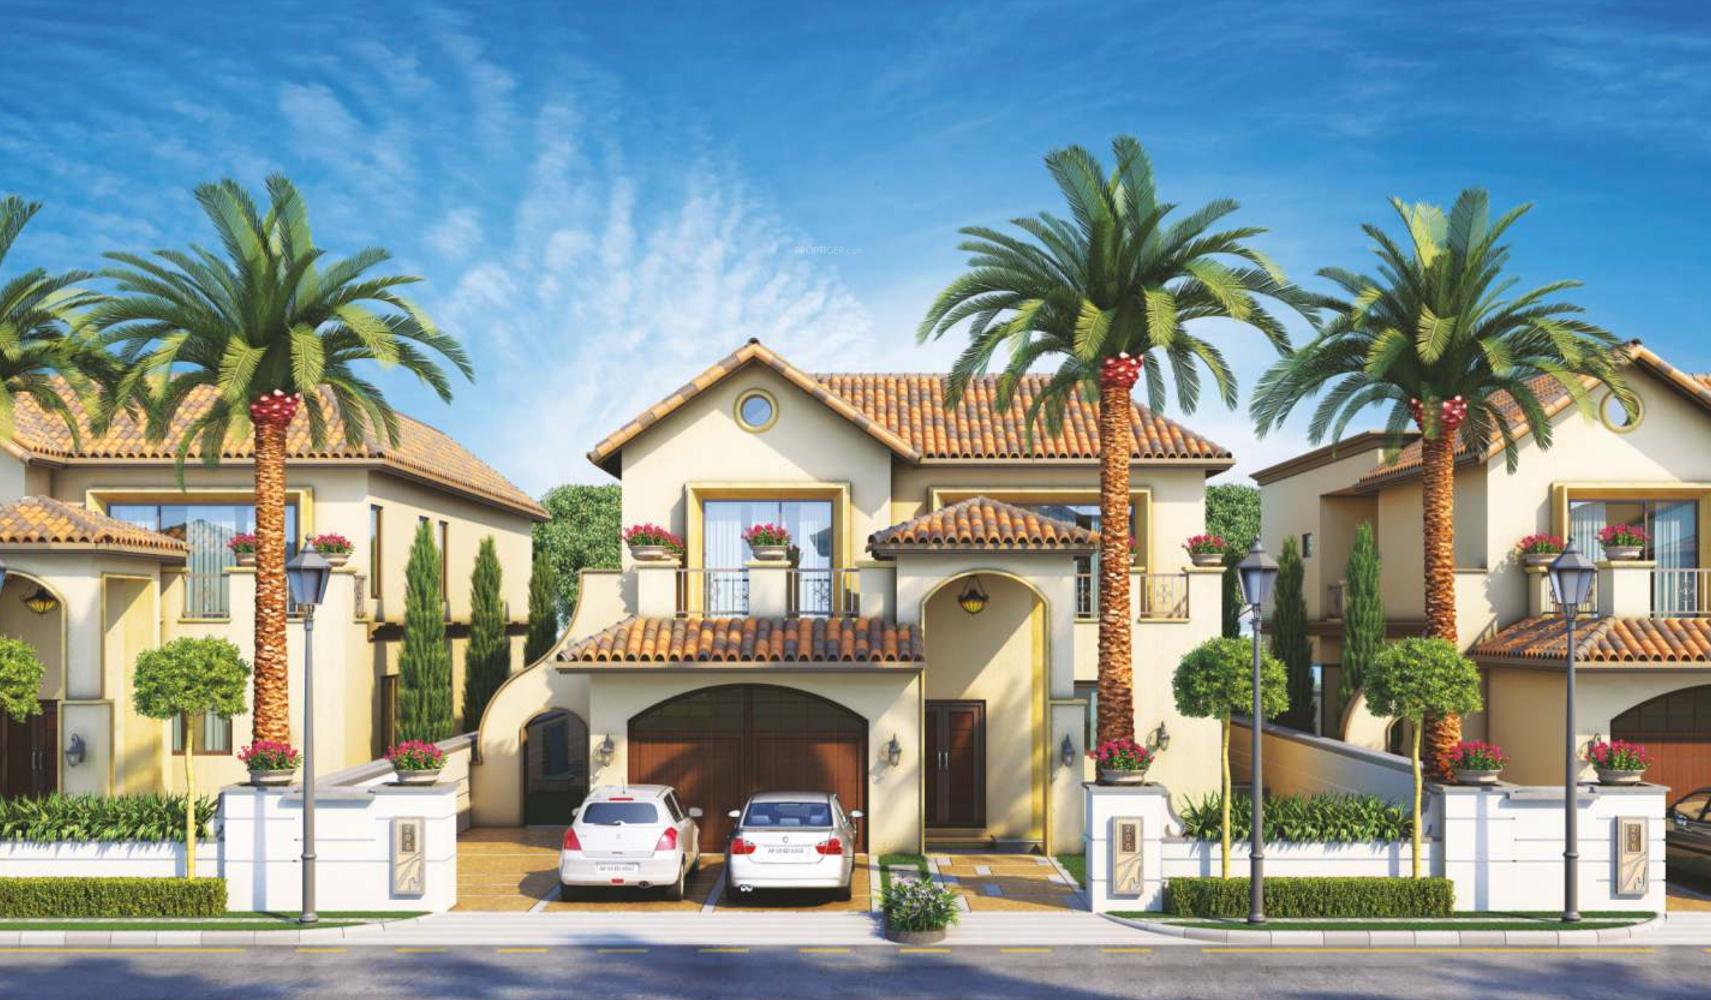 7400 sq ft 4 bhk 4t villa for sale in sri aditya casa for Grande casa padronale